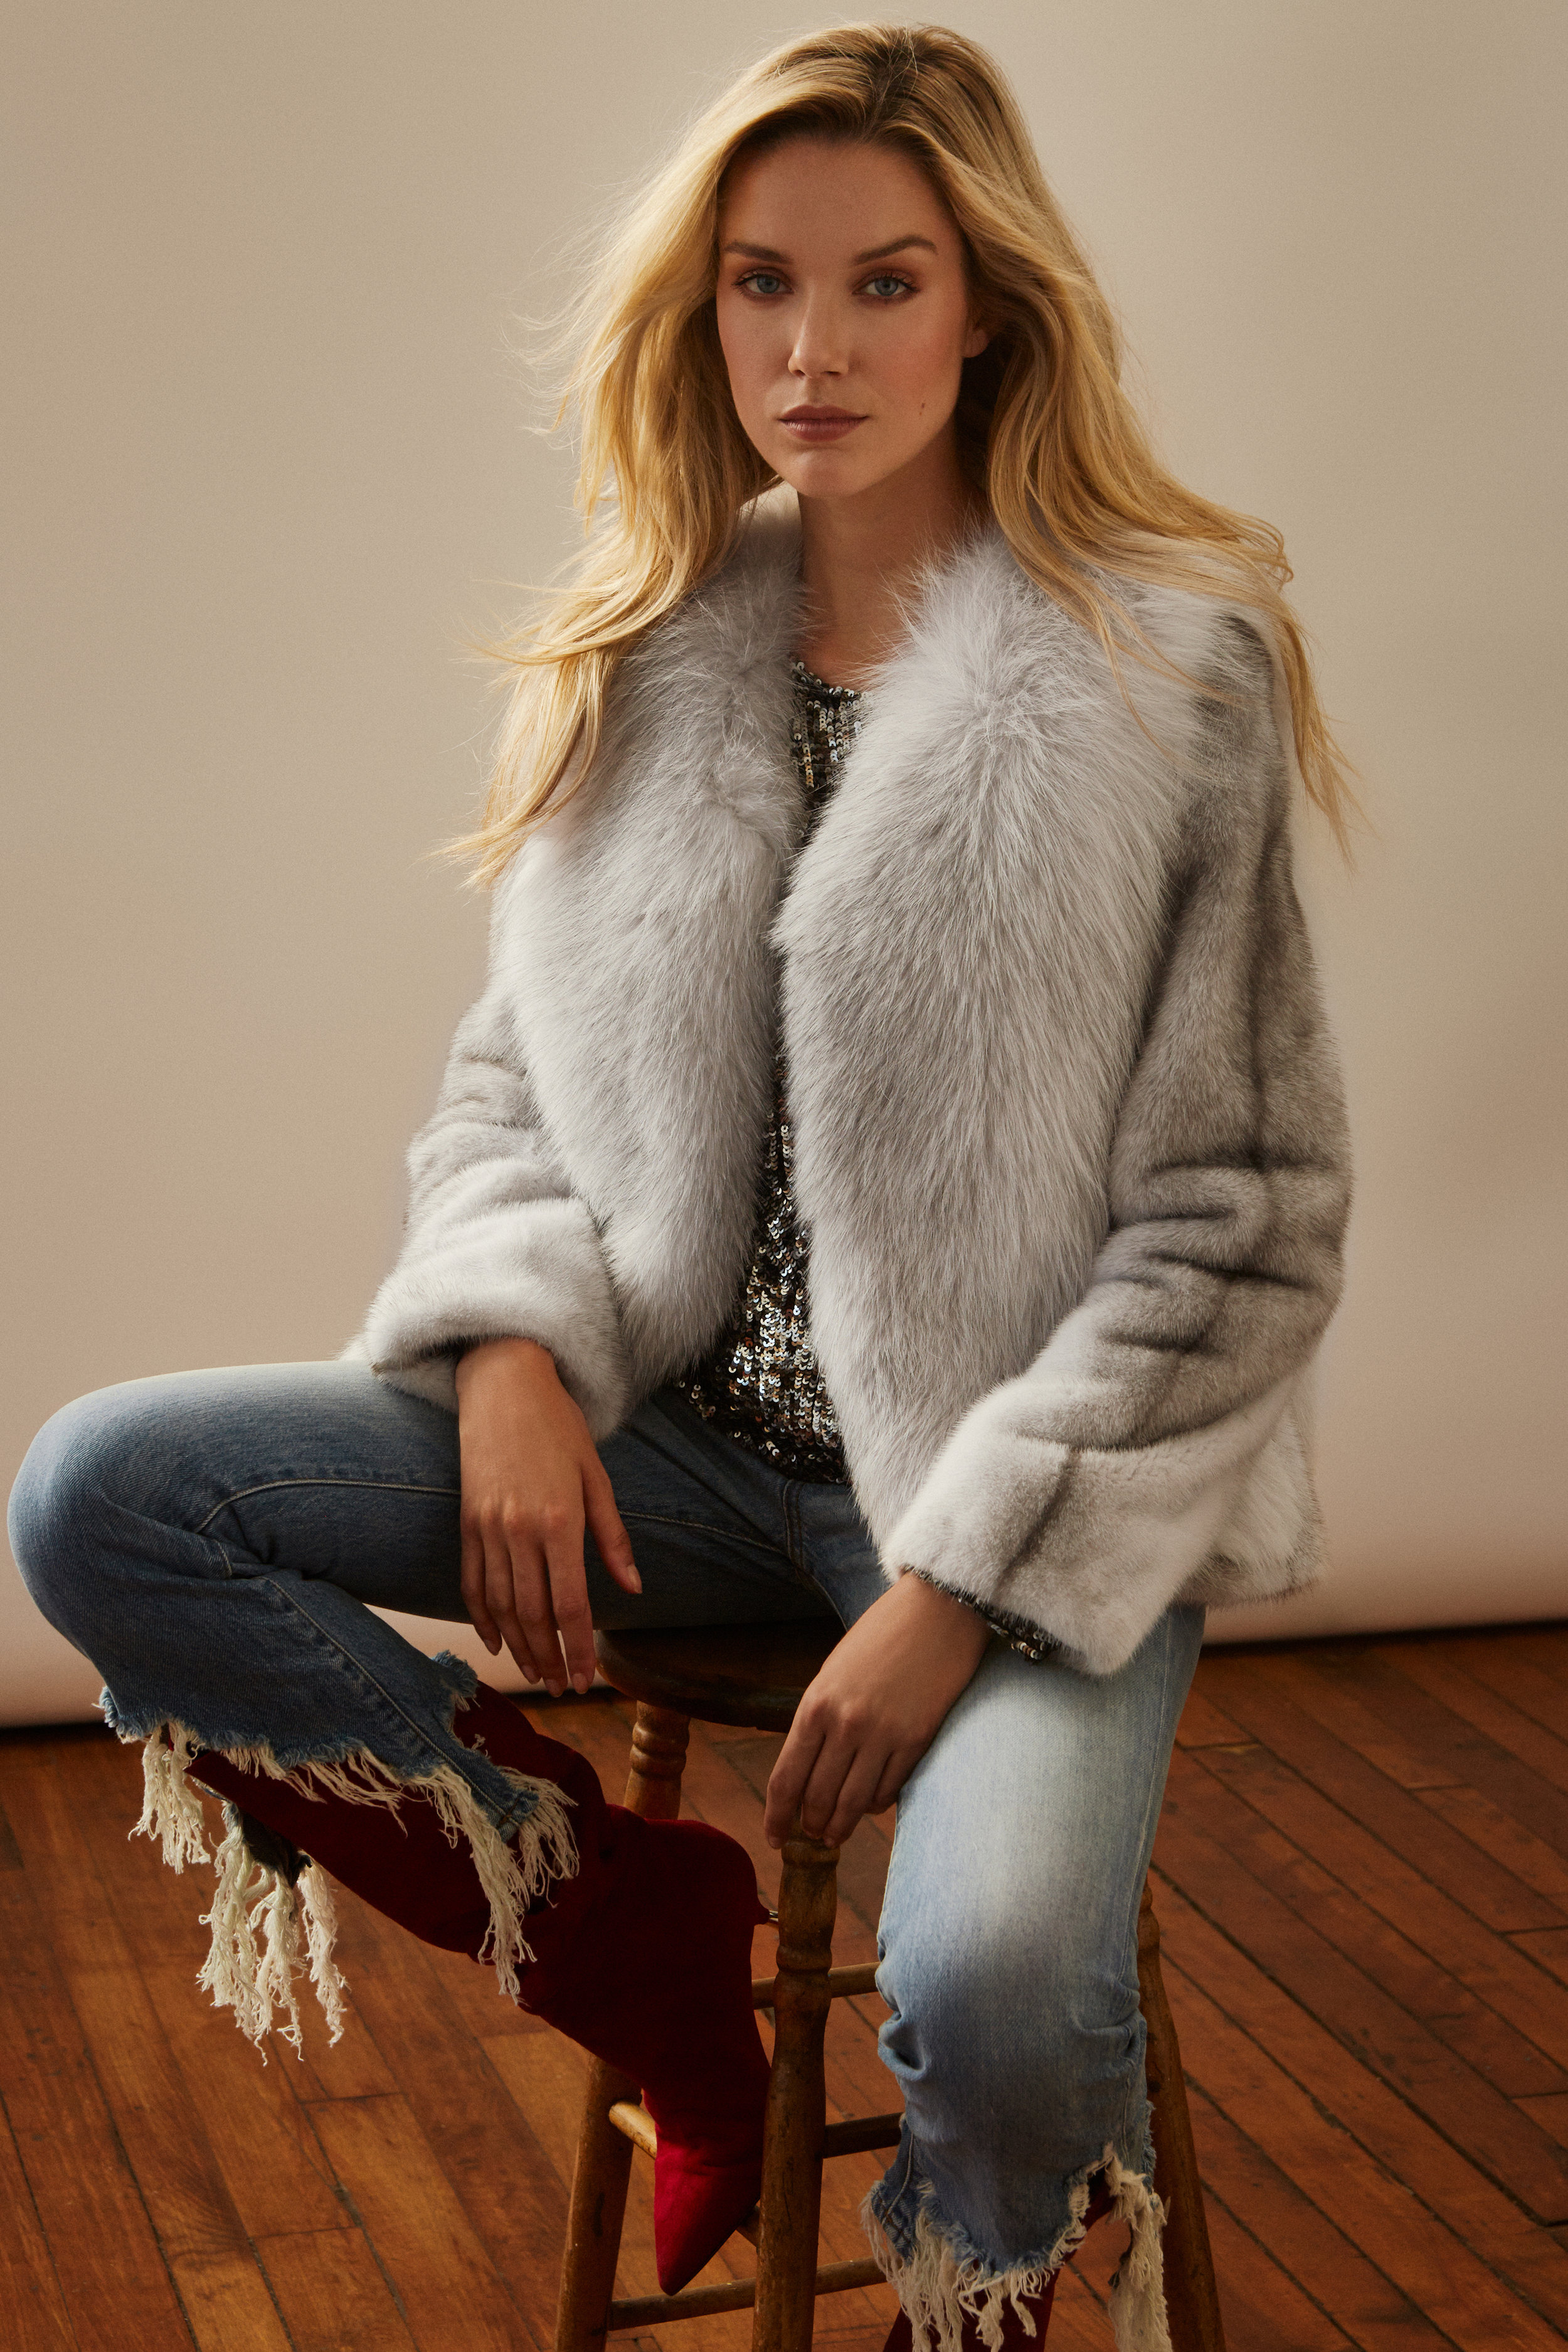 campaign for   LYSA LASH   hair&makeup   KARIMA VEZINA (ST-GERMAIN)   model   MARIE-LAURENCE(FOLIO)    styling   RIMA CHAHINE